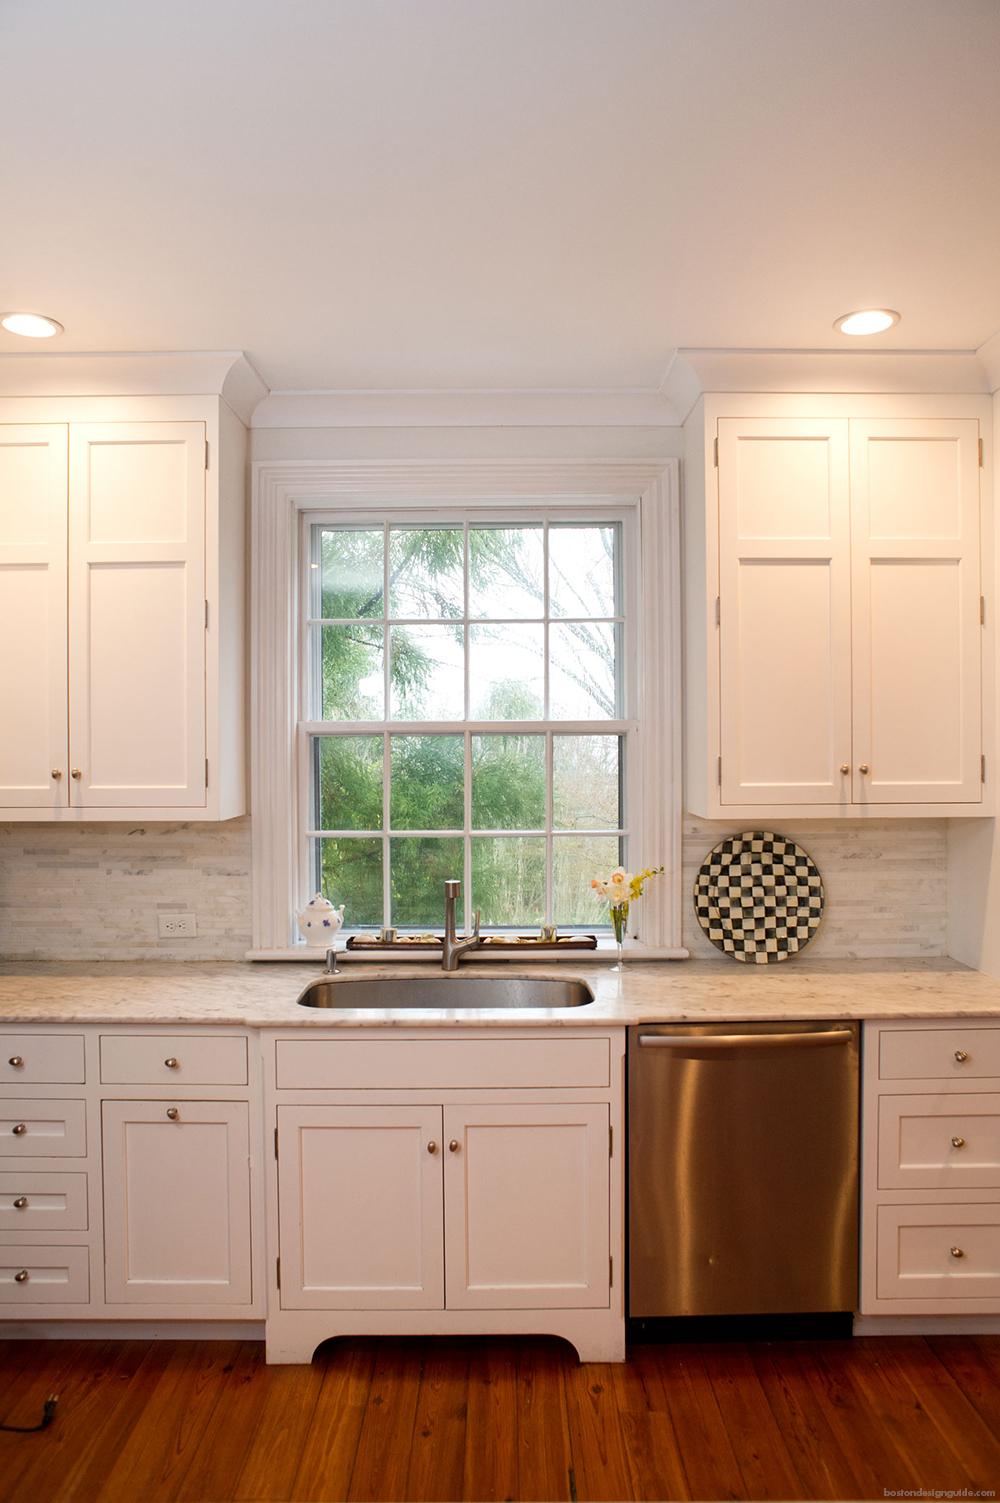 Kitchen and bath renovation tips